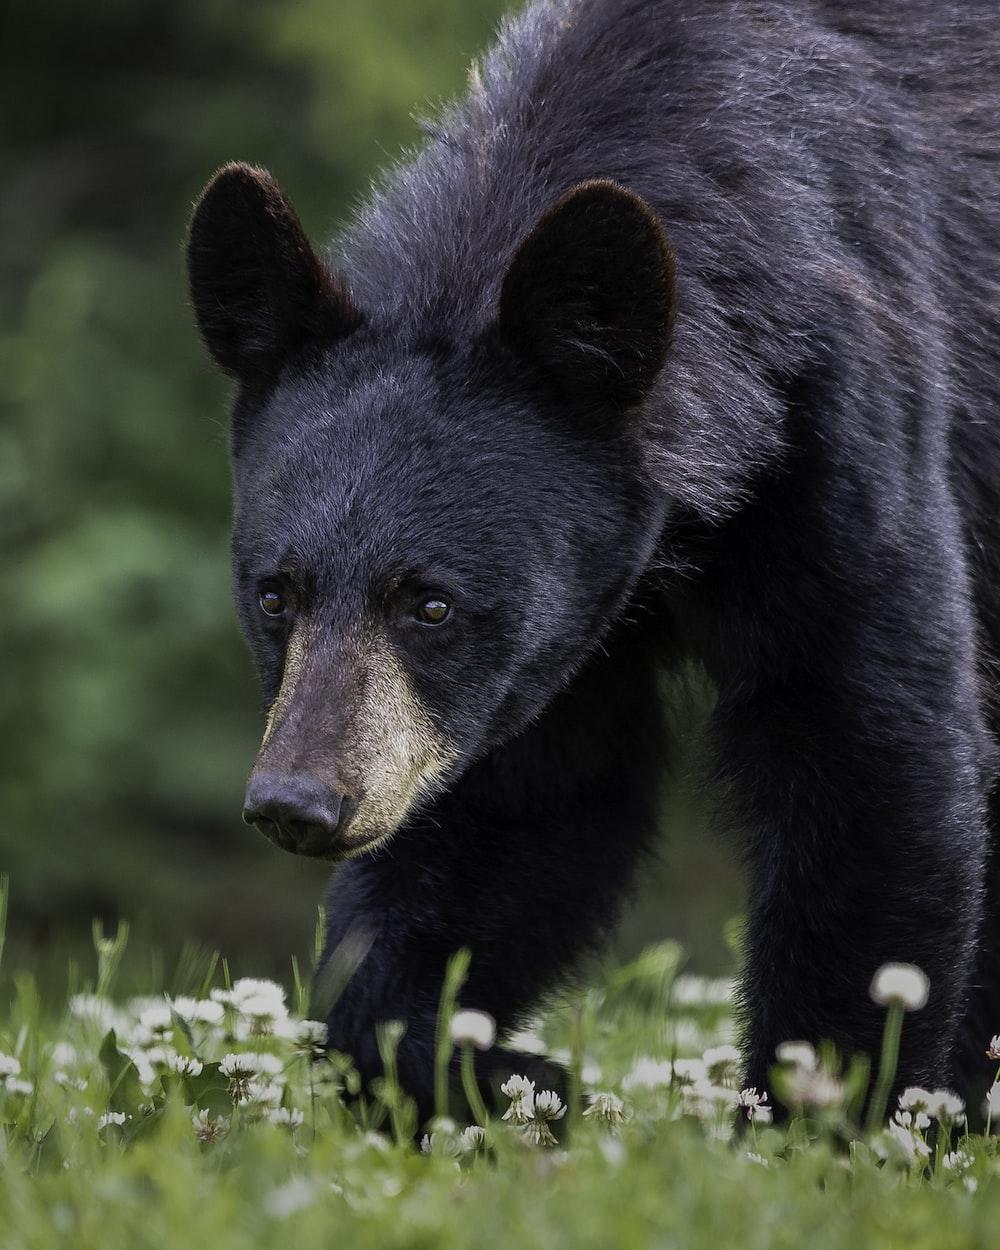 black bear on green grass during daytime